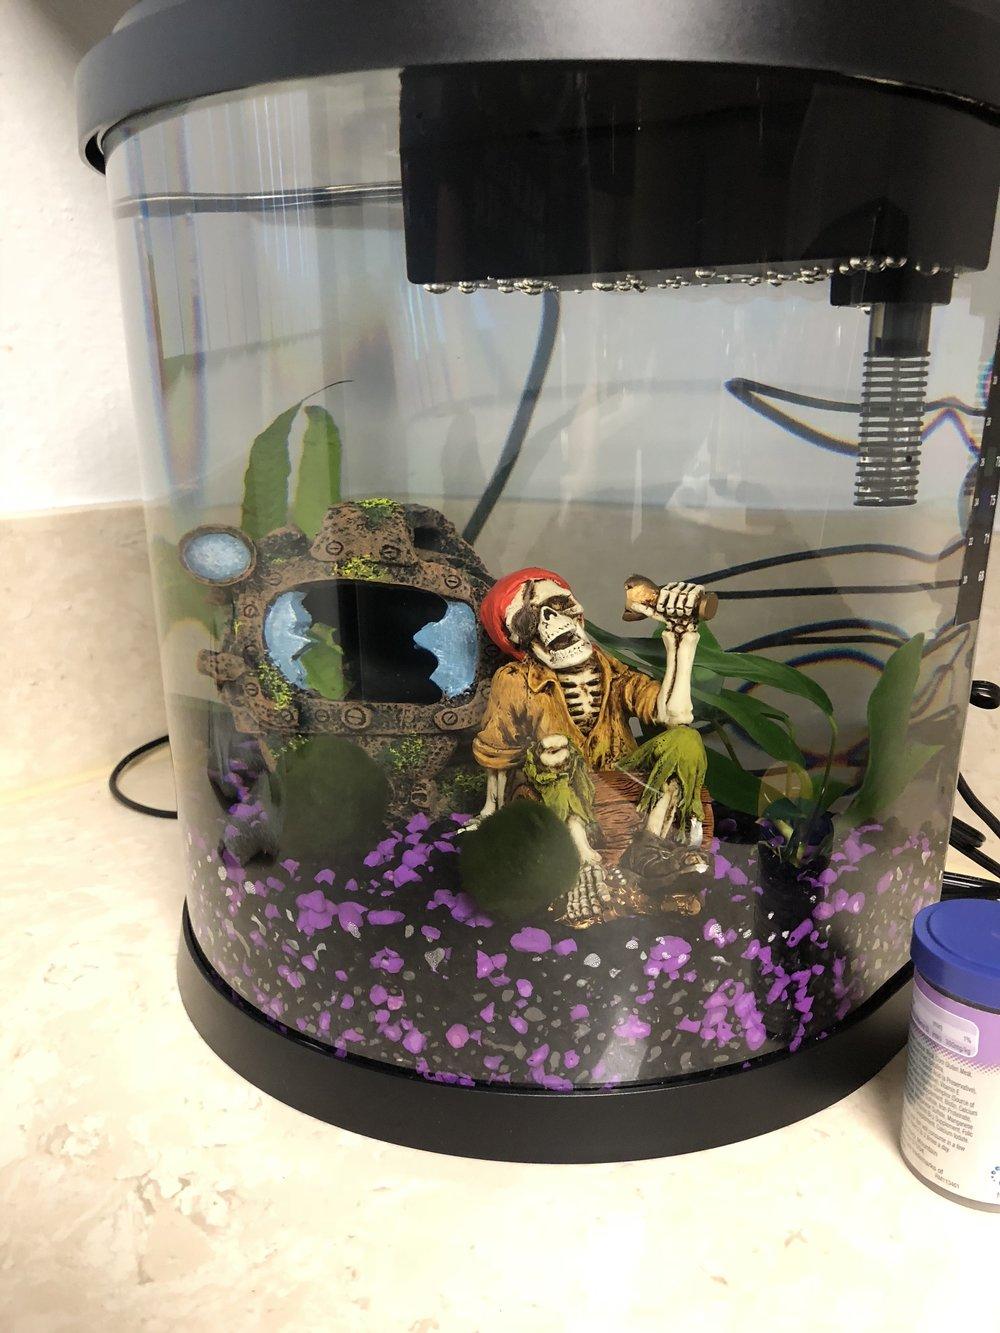 Tank Part 2